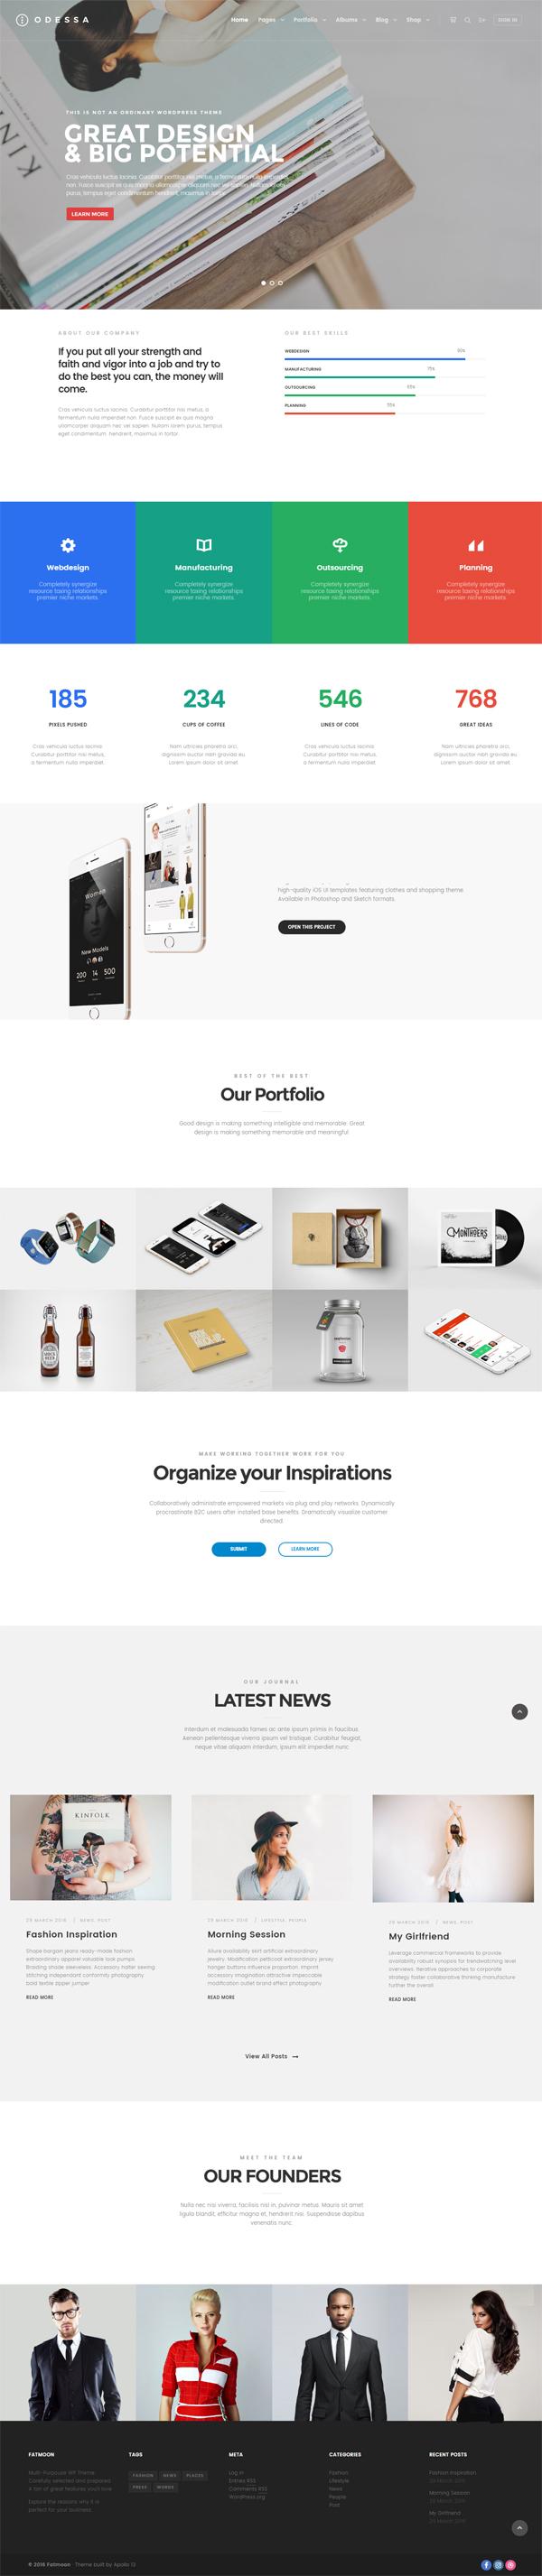 FatMoon - Creative & Photography Multi-Purpose Theme